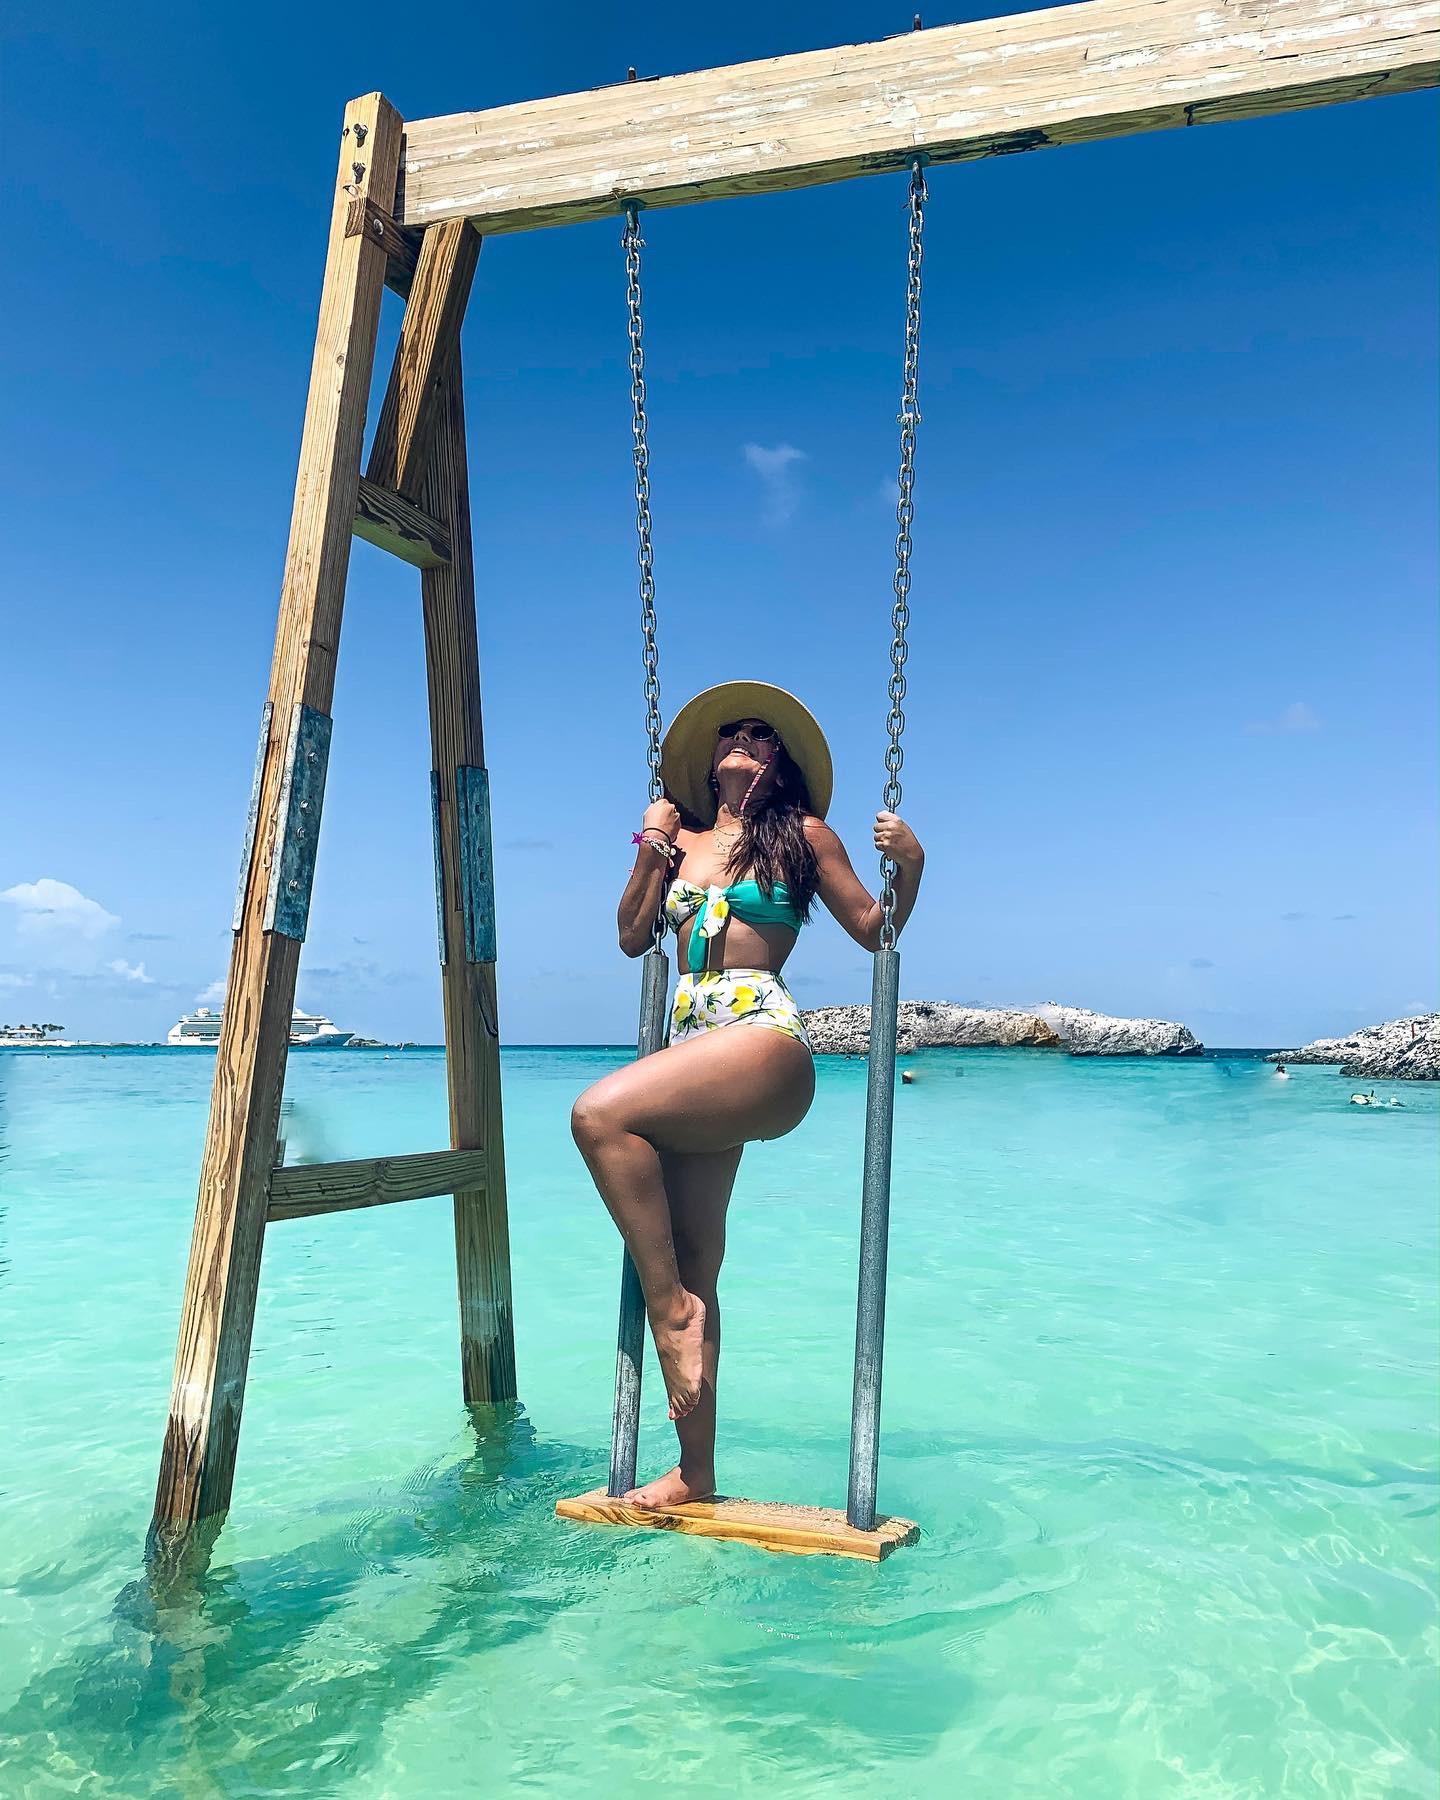 fashion travel blogger paloma de la cruz cruise paradise bahamas island caribbean vacation